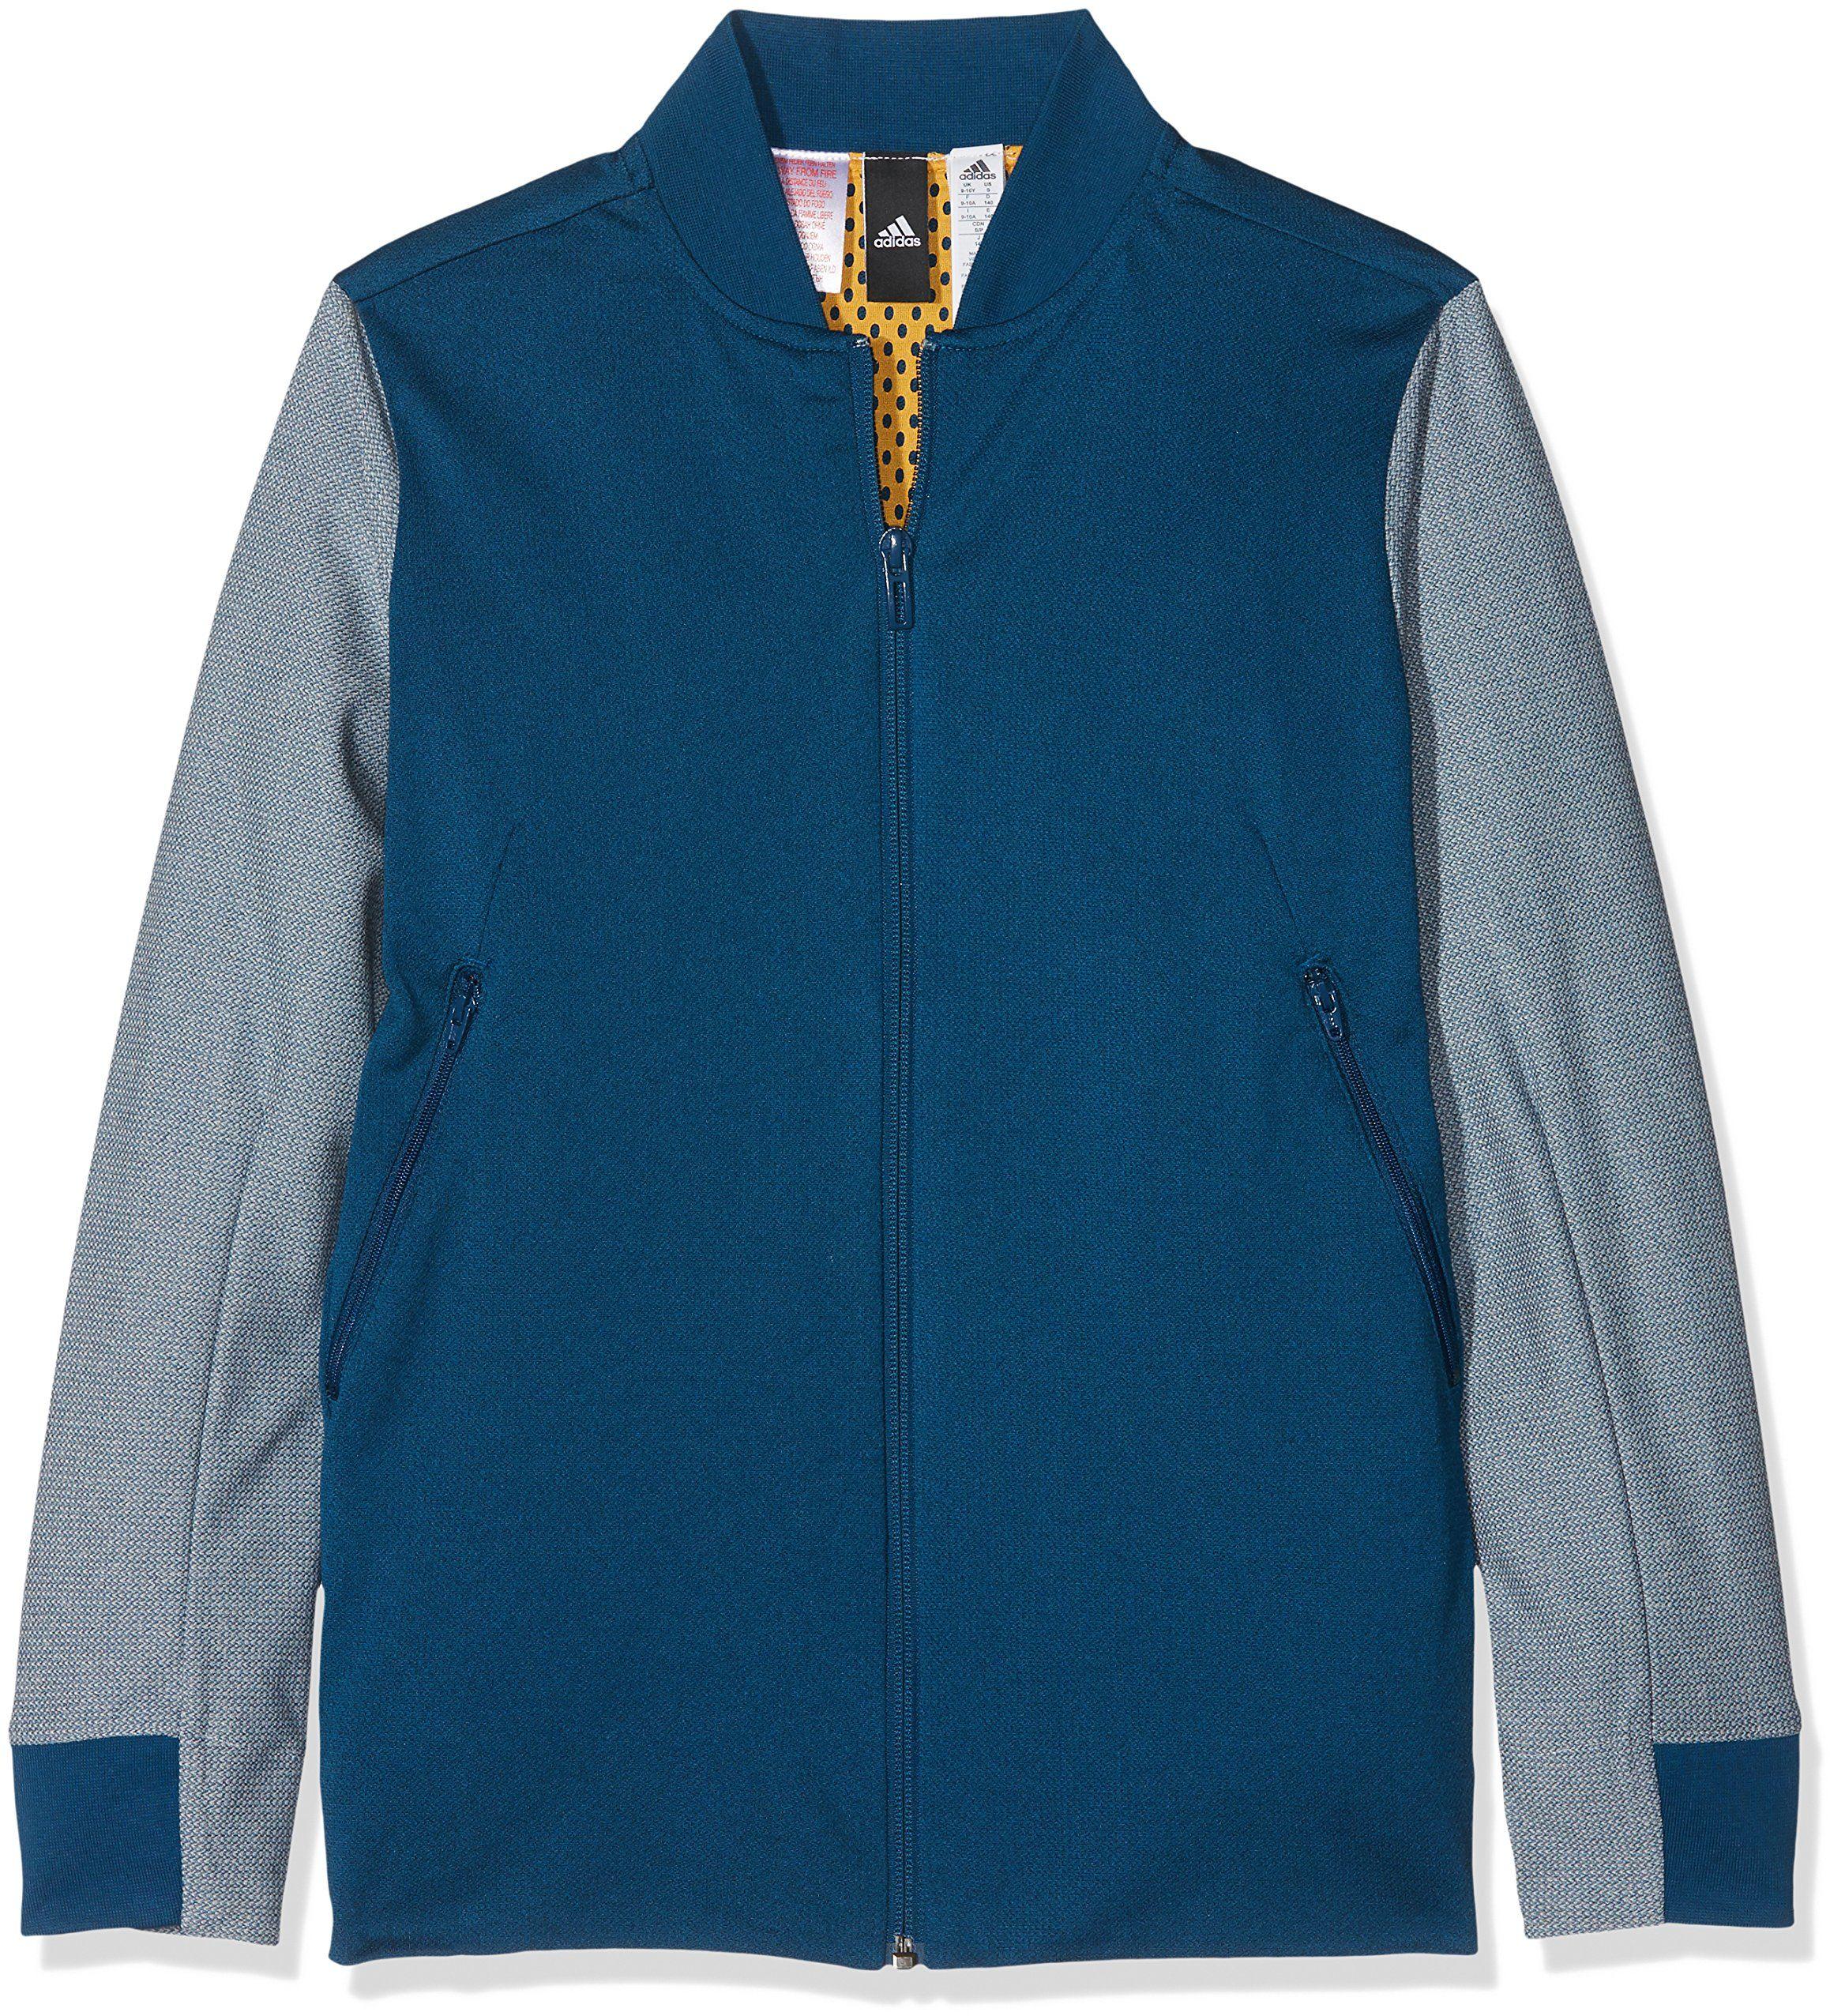 Adidas Boys'' Yb ID kurtka bomberka, niebieska/azunoc/Gridos, rozmiar 140